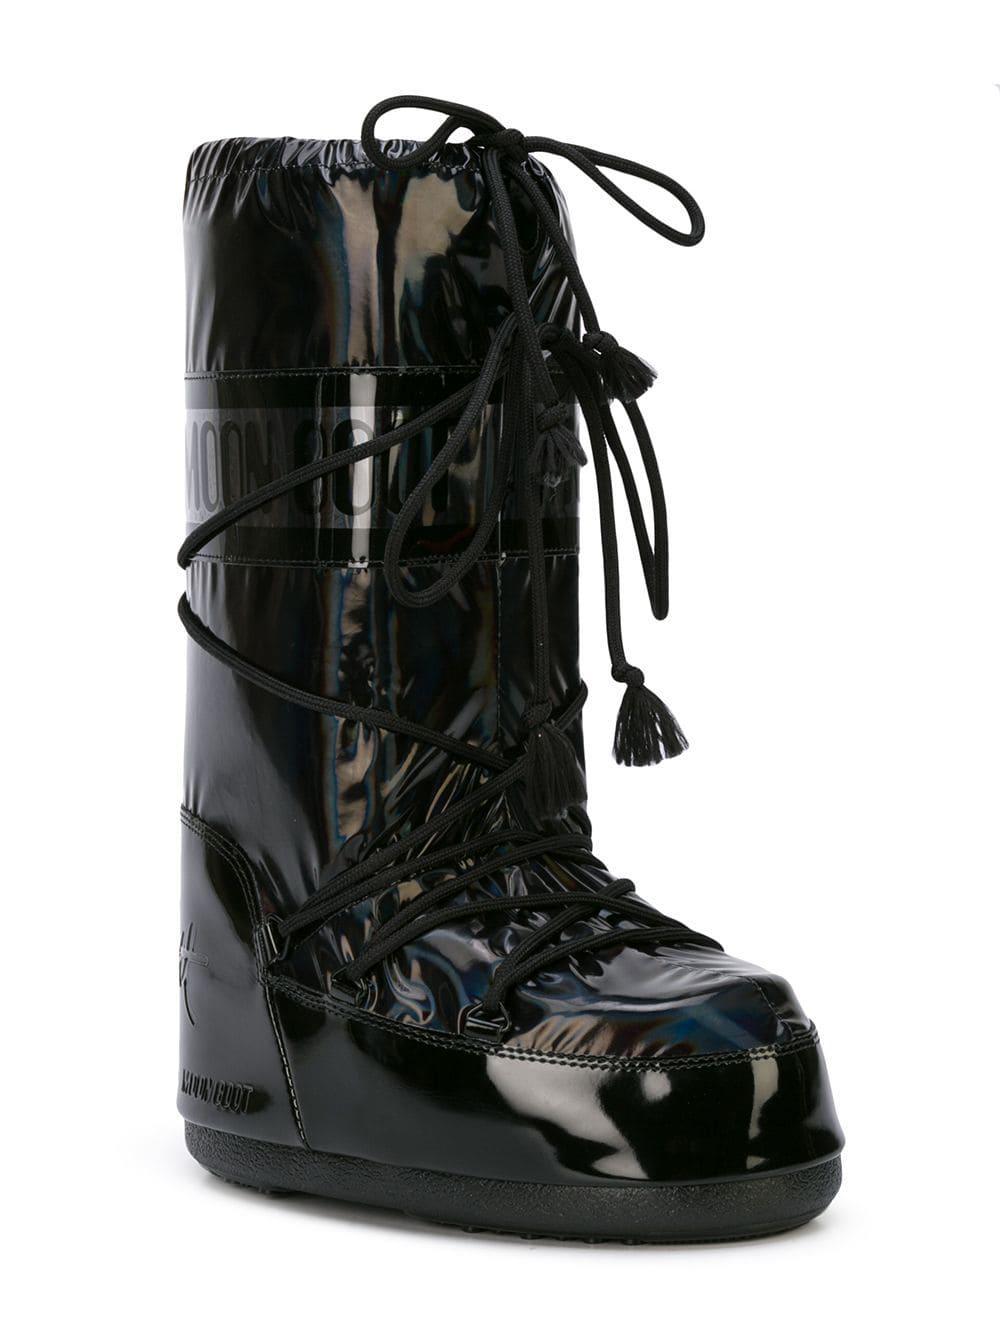 d79743a4502a Jeremy Scott - Black X Moon Boots - Lyst. View fullscreen